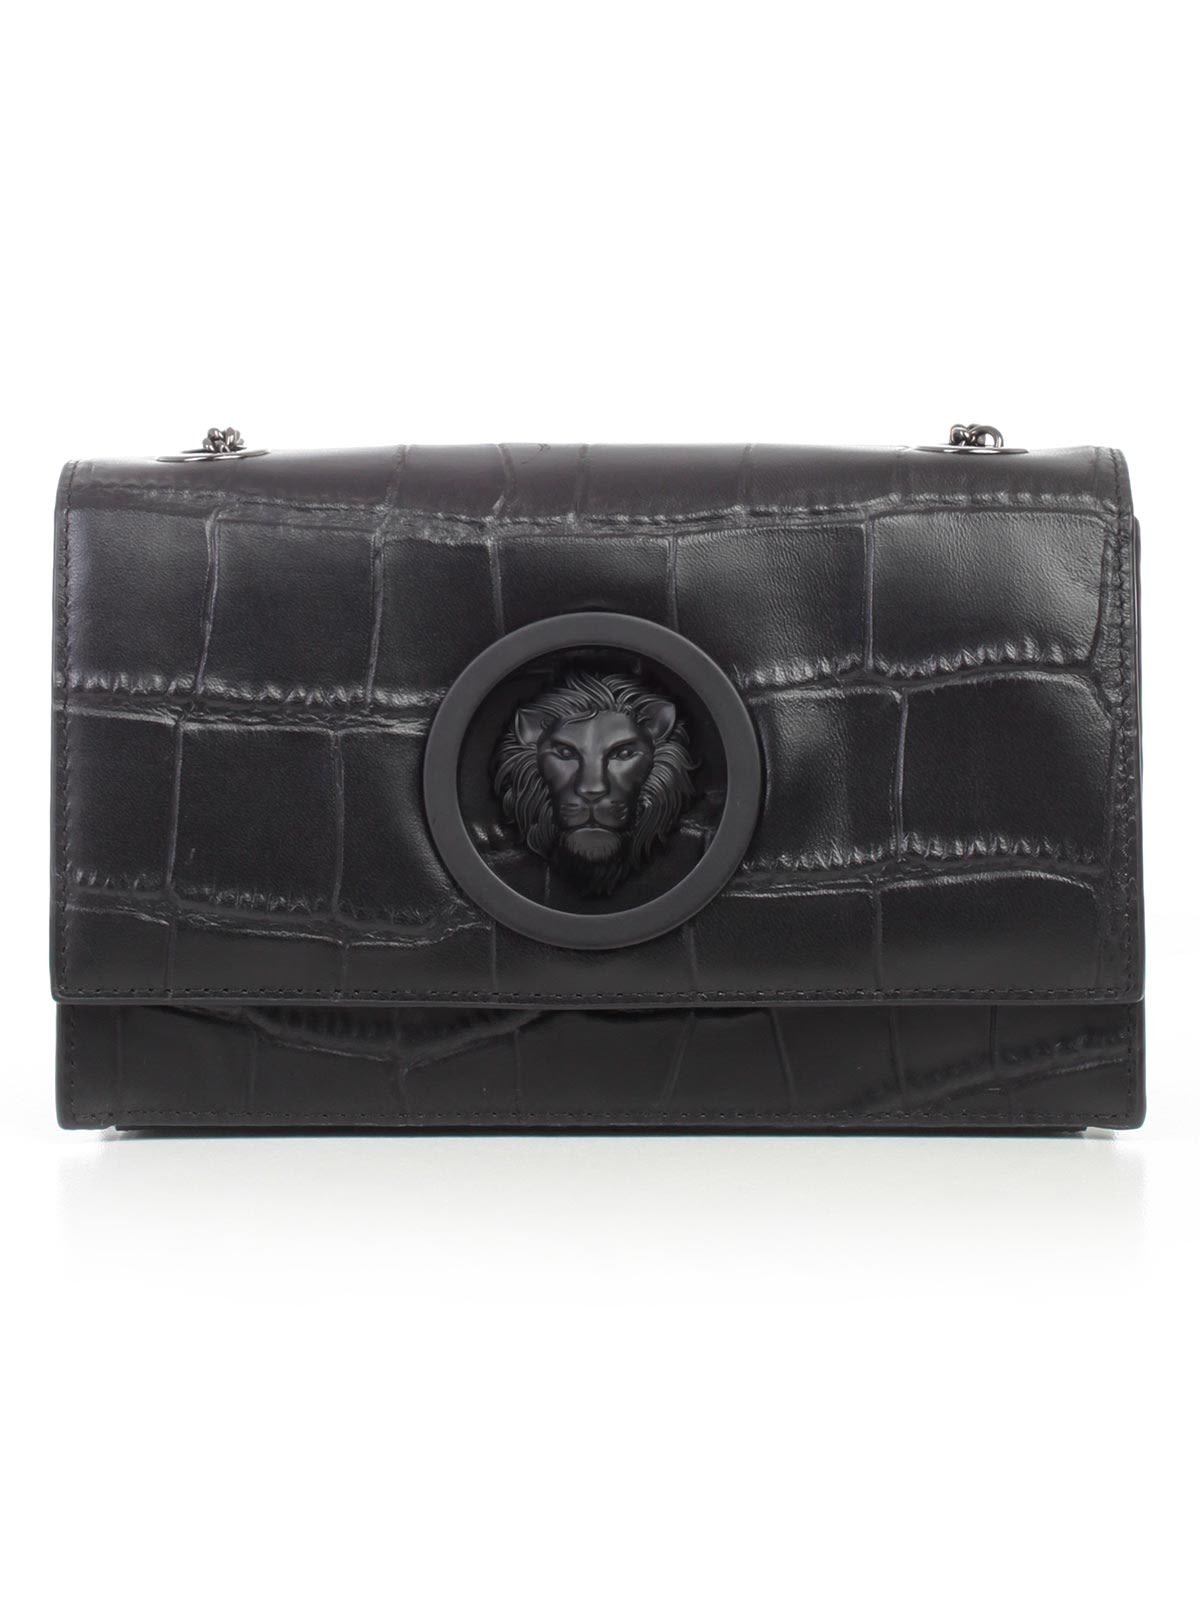 1f0c0bfa48c7 Versus Versace Versus Versace Lion Embossed Shoulder Bag - Basic ...